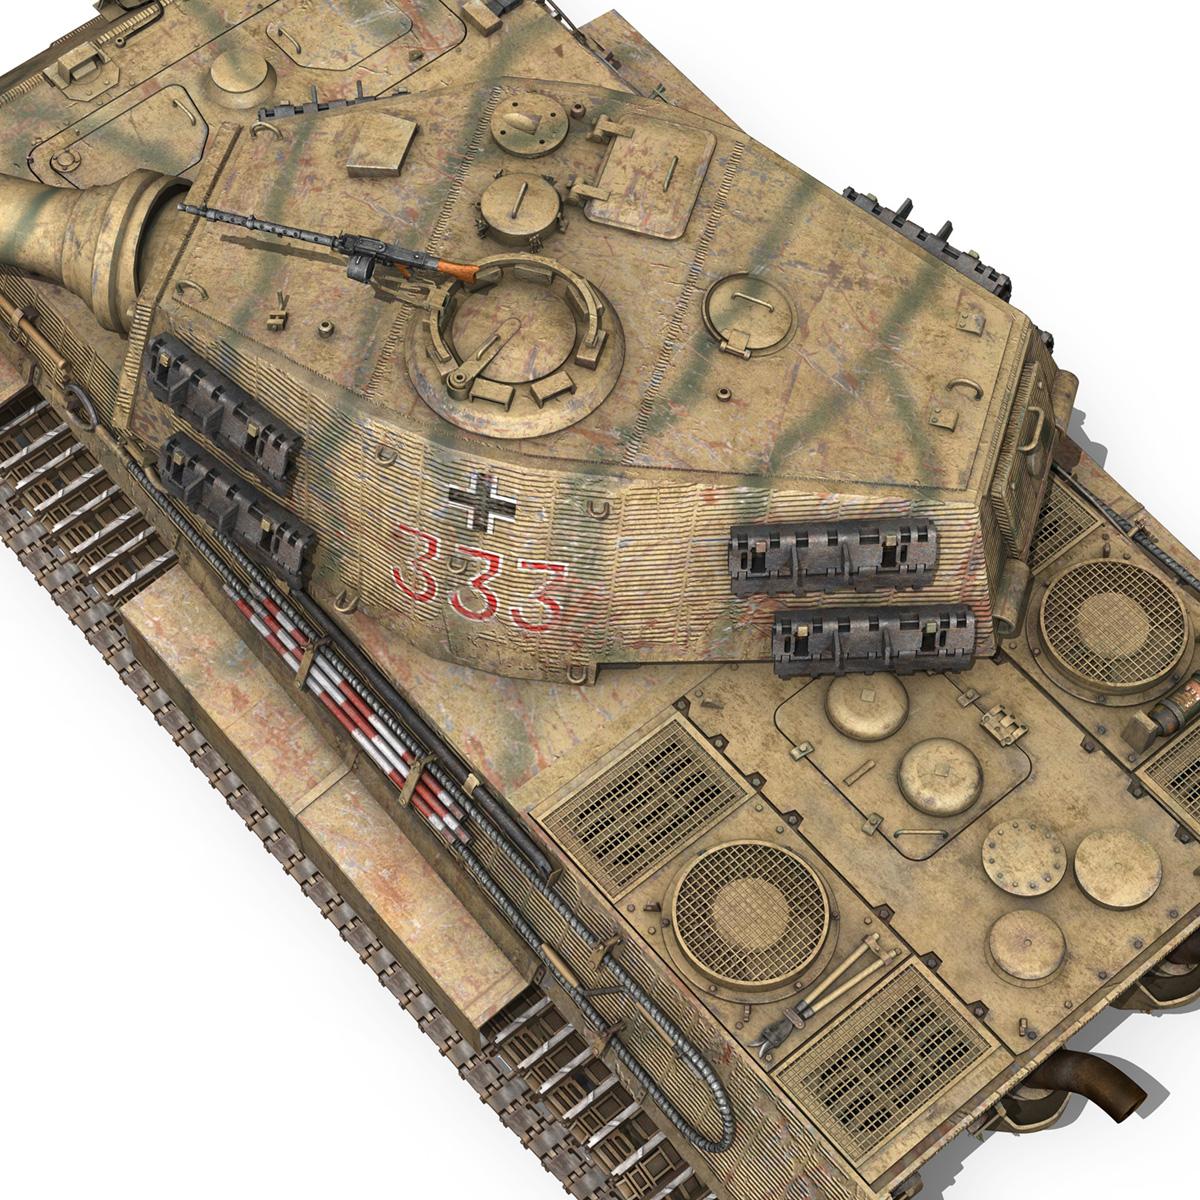 panzerkampfwagen vi – ausf.b – tiger ii – 333 3d model 3ds lwo lw lws obj c4d 265608